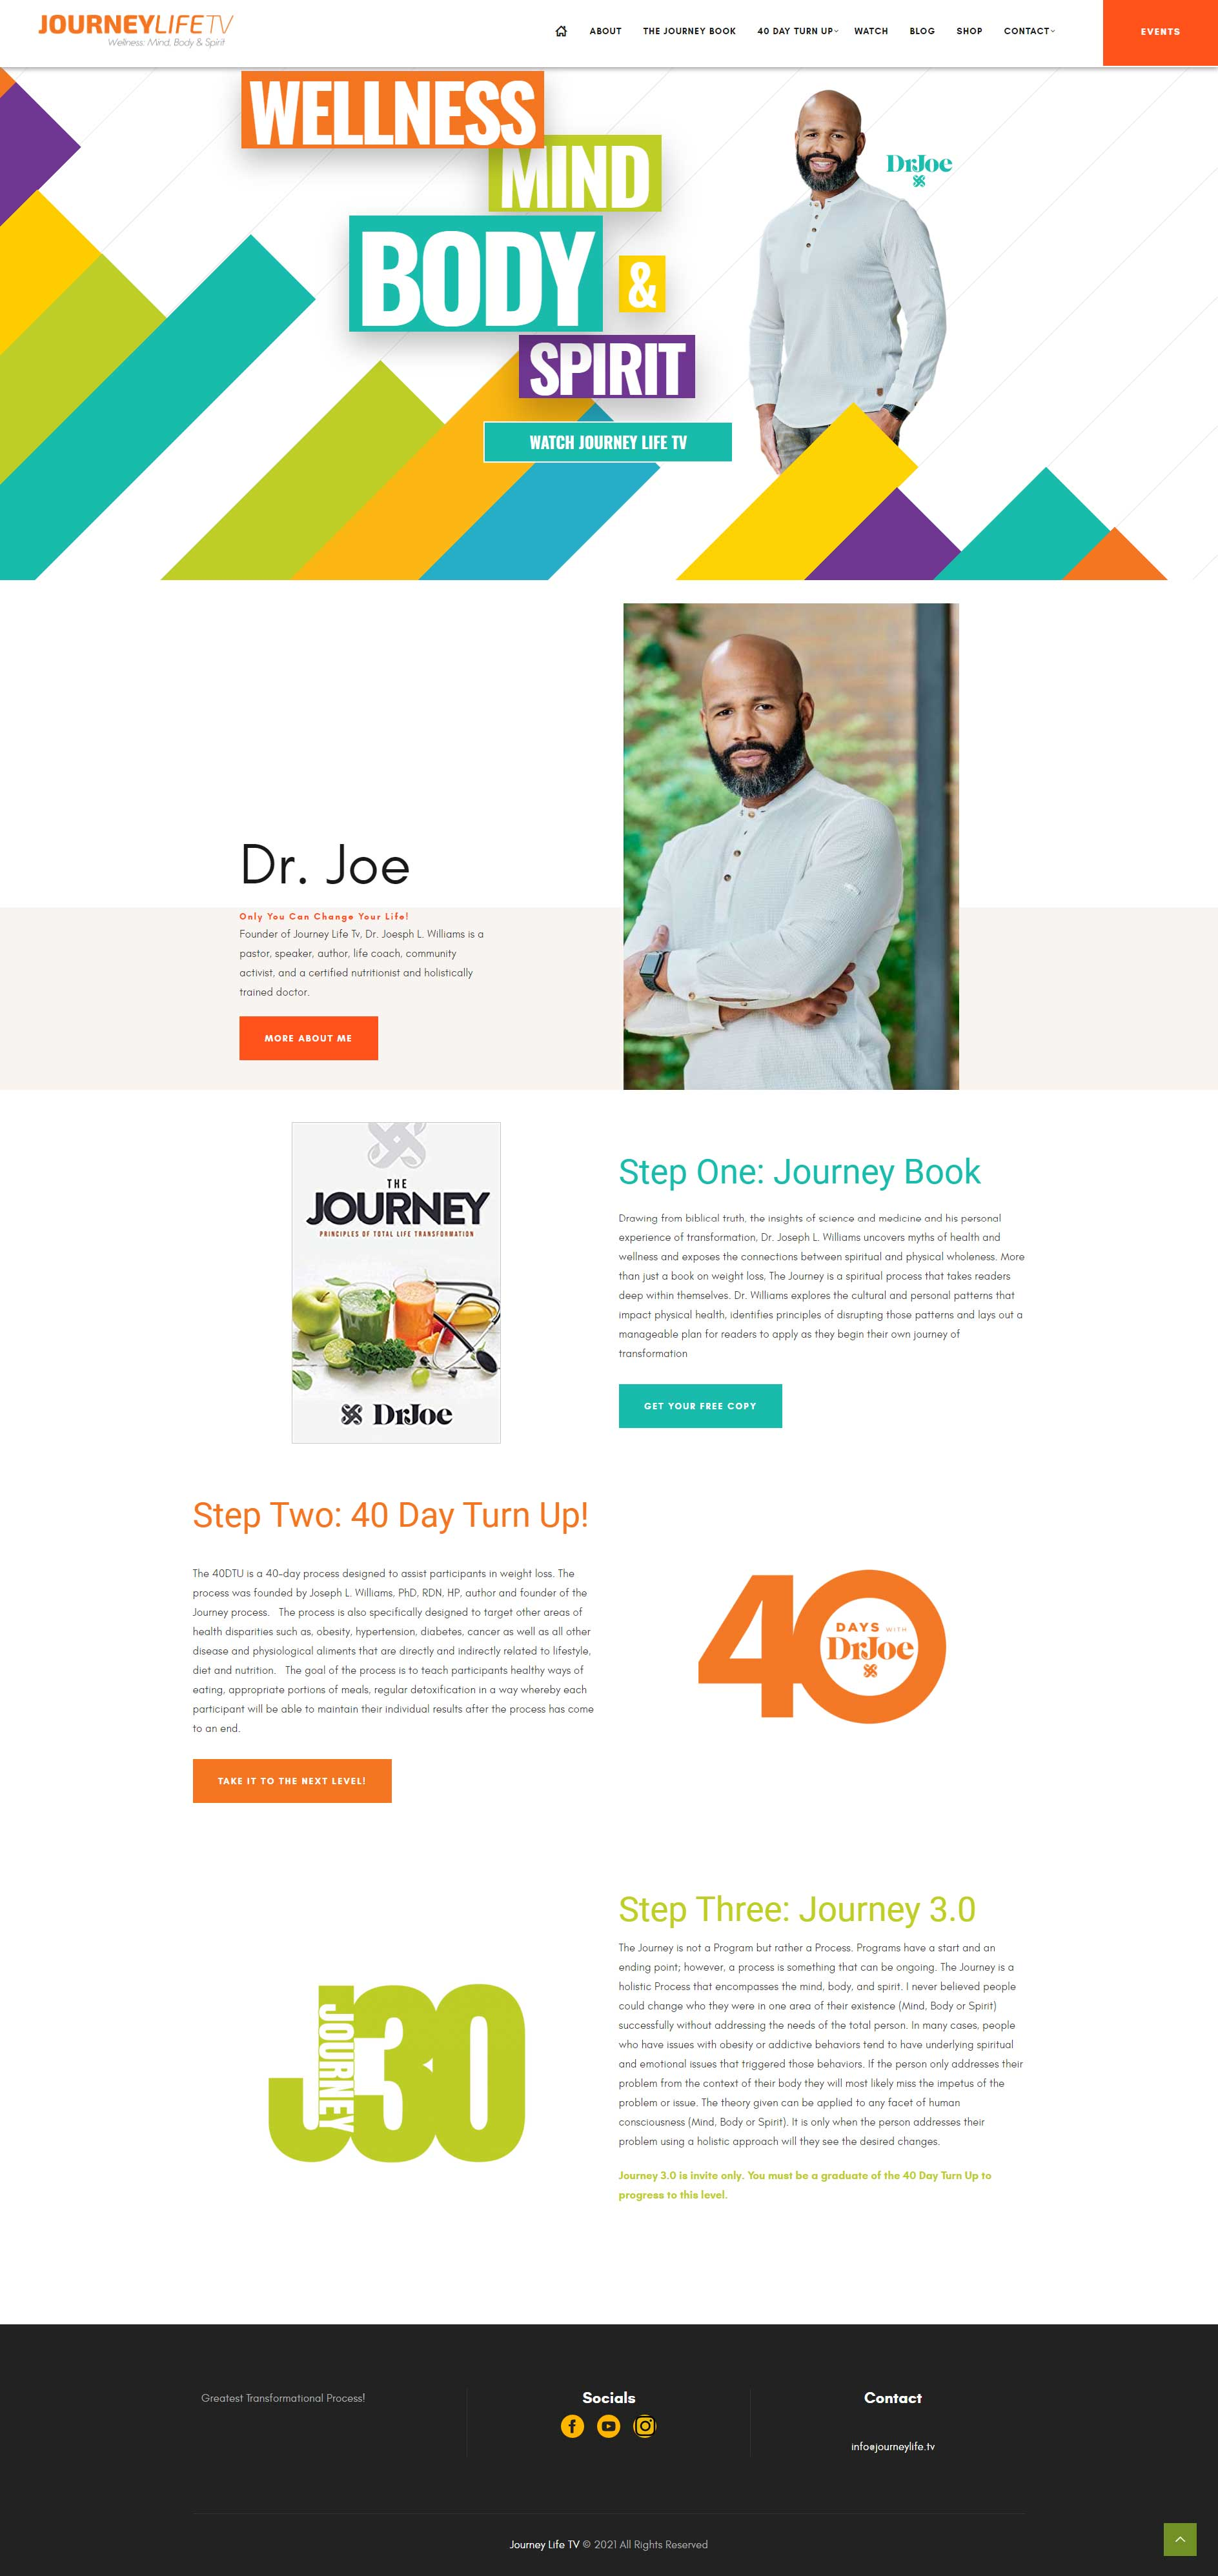 journeylife-wordpress-design-home